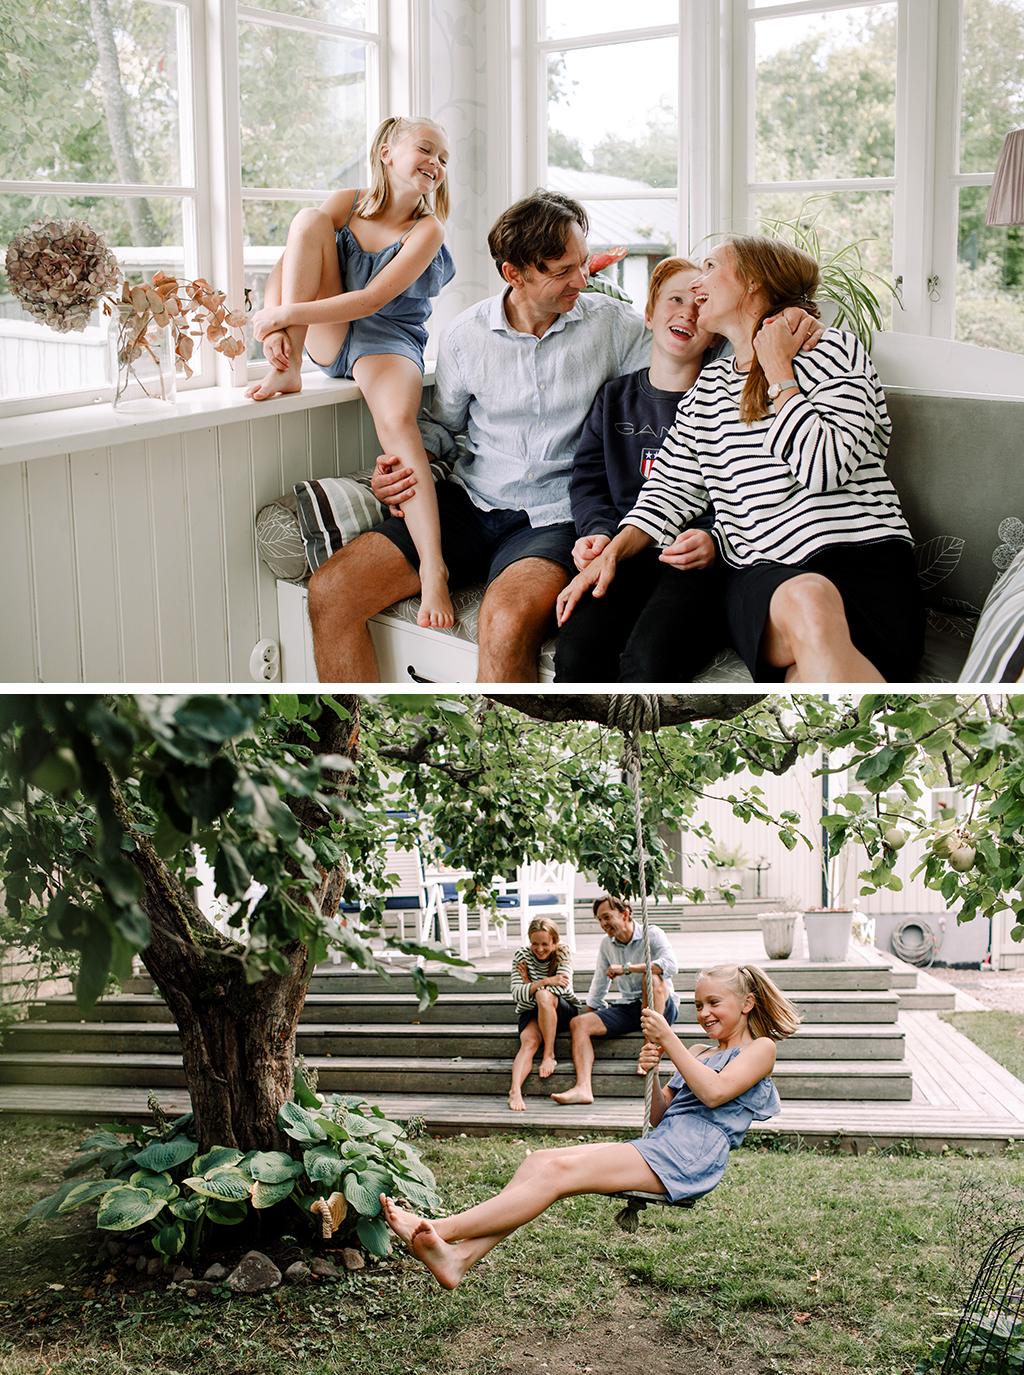 Hemmahosfotografering_Lifestyle_familjefotograf_Stockholm_5.jpg